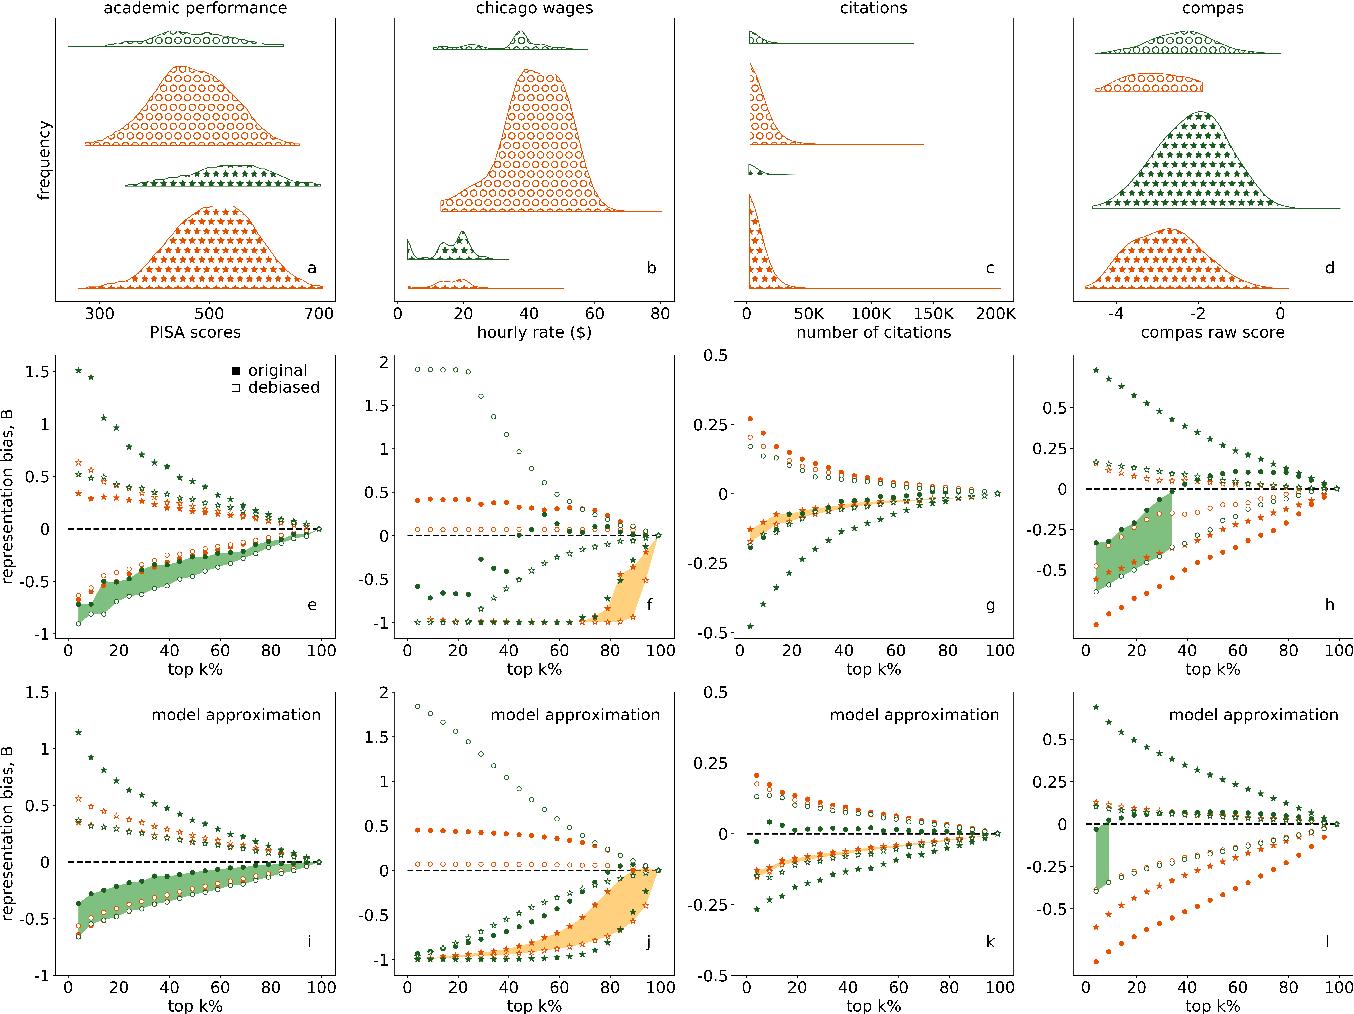 Figure 2 for Quota-based debiasing can decrease representation of already underrepresented groups